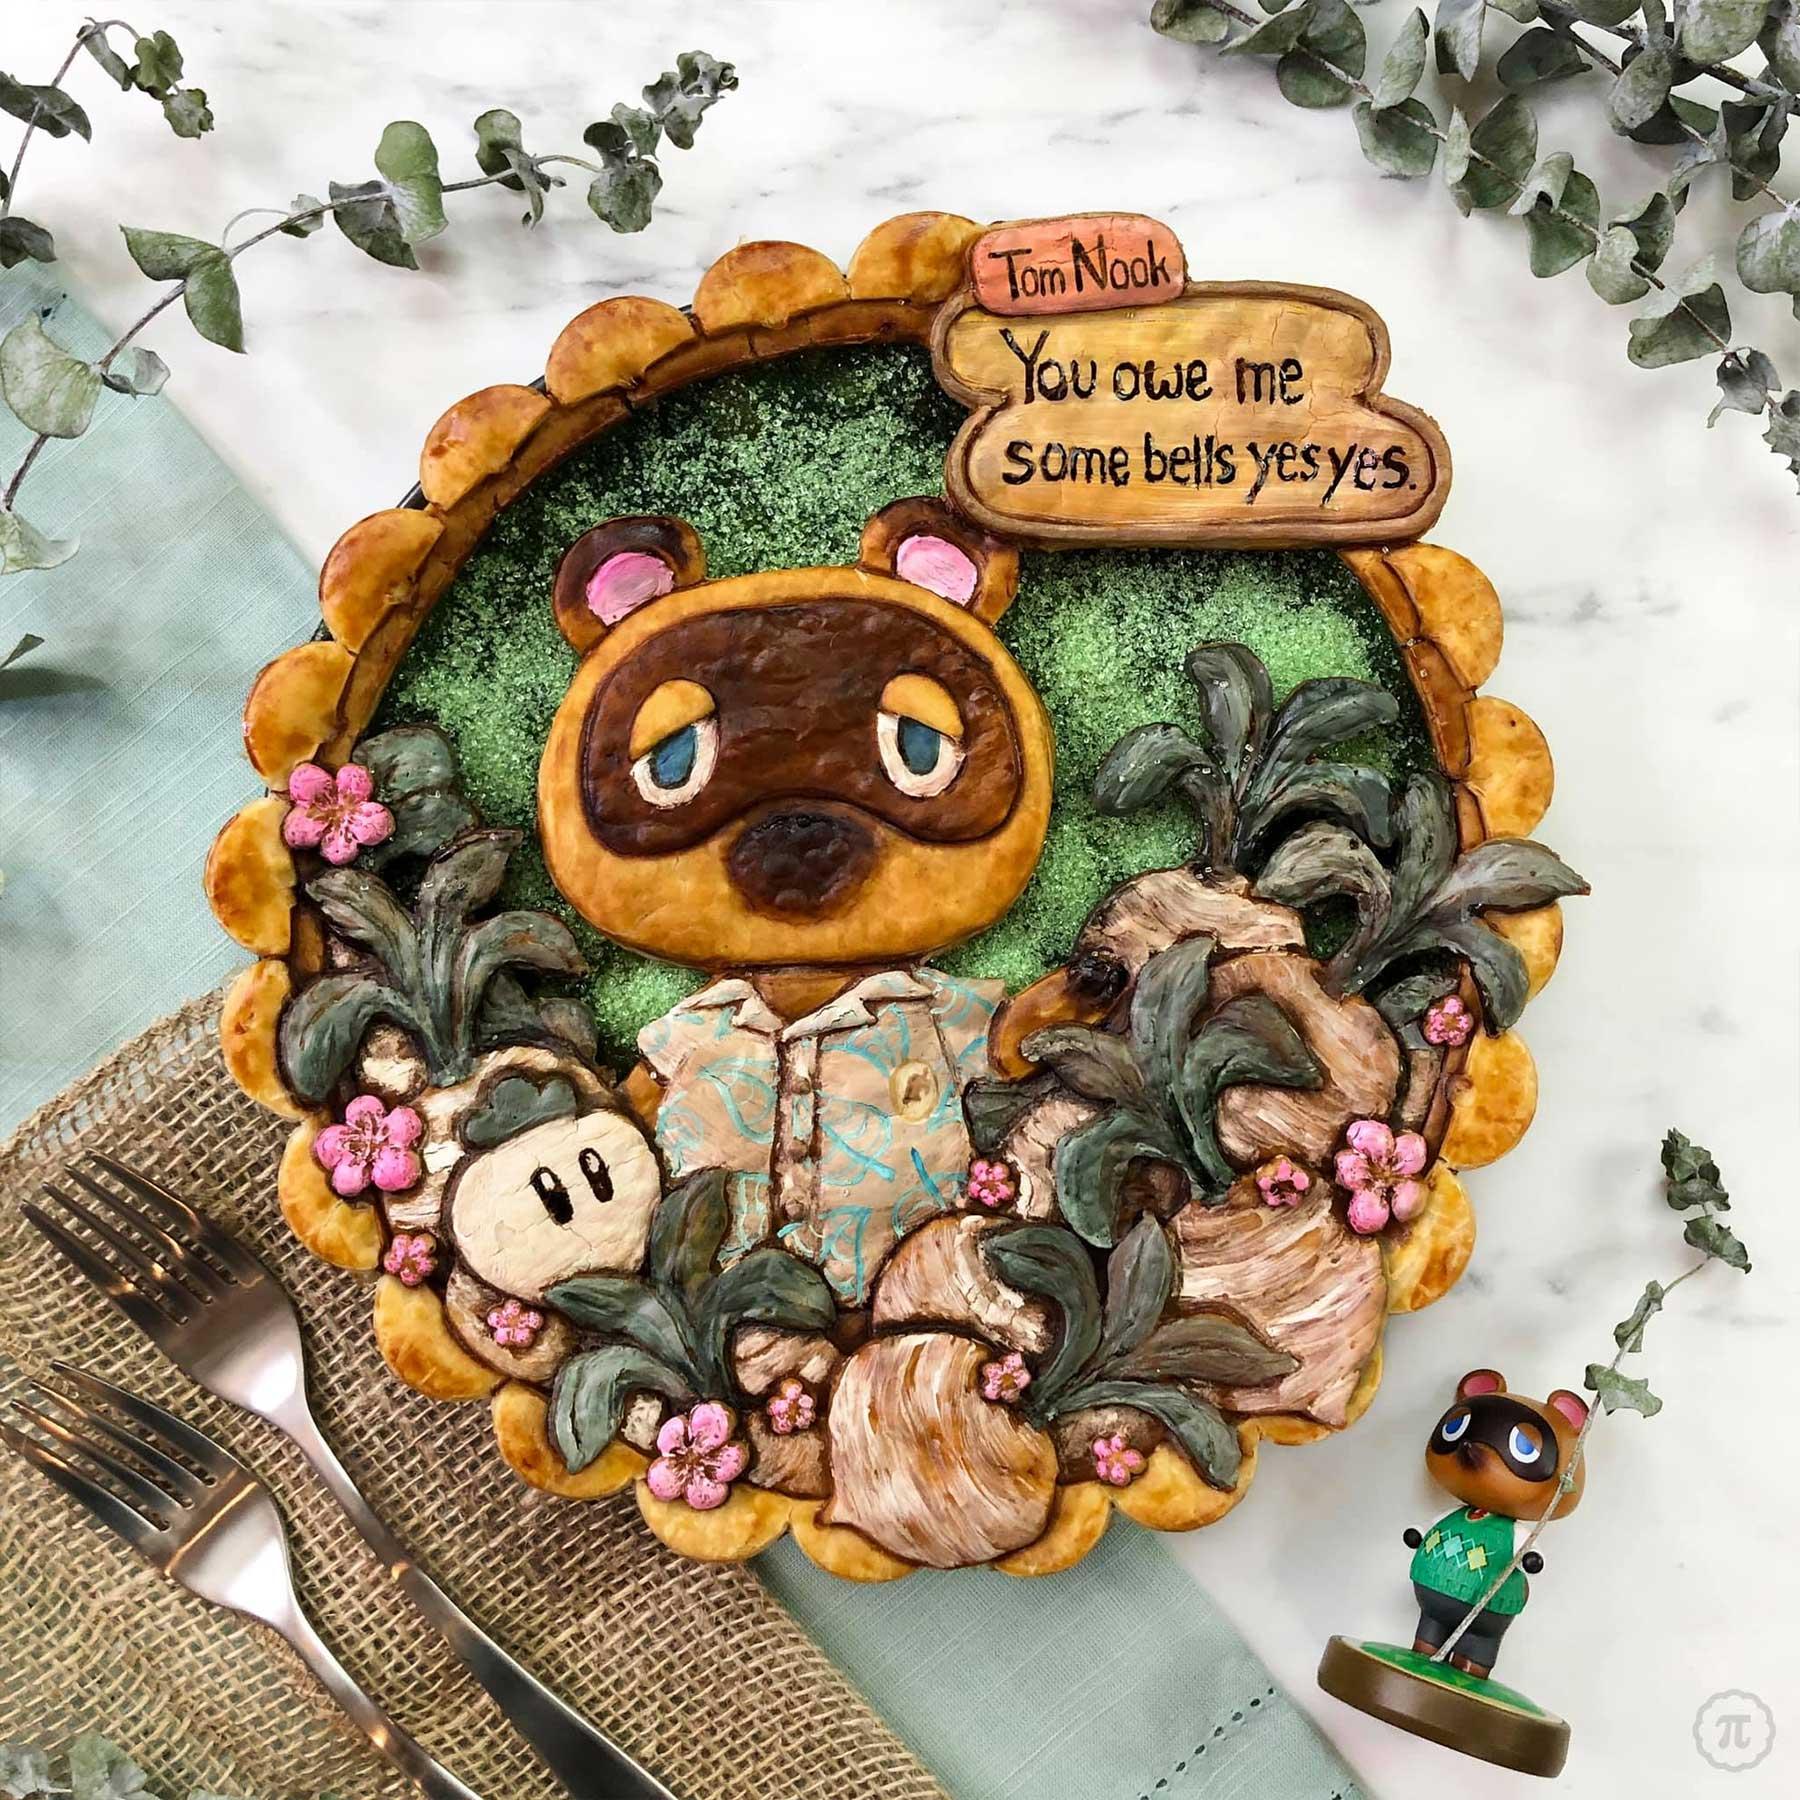 Kreative Kuchenkunst von Jessica Clark-Bojin piesareawesome-Jessica-Clark-Bojin_03